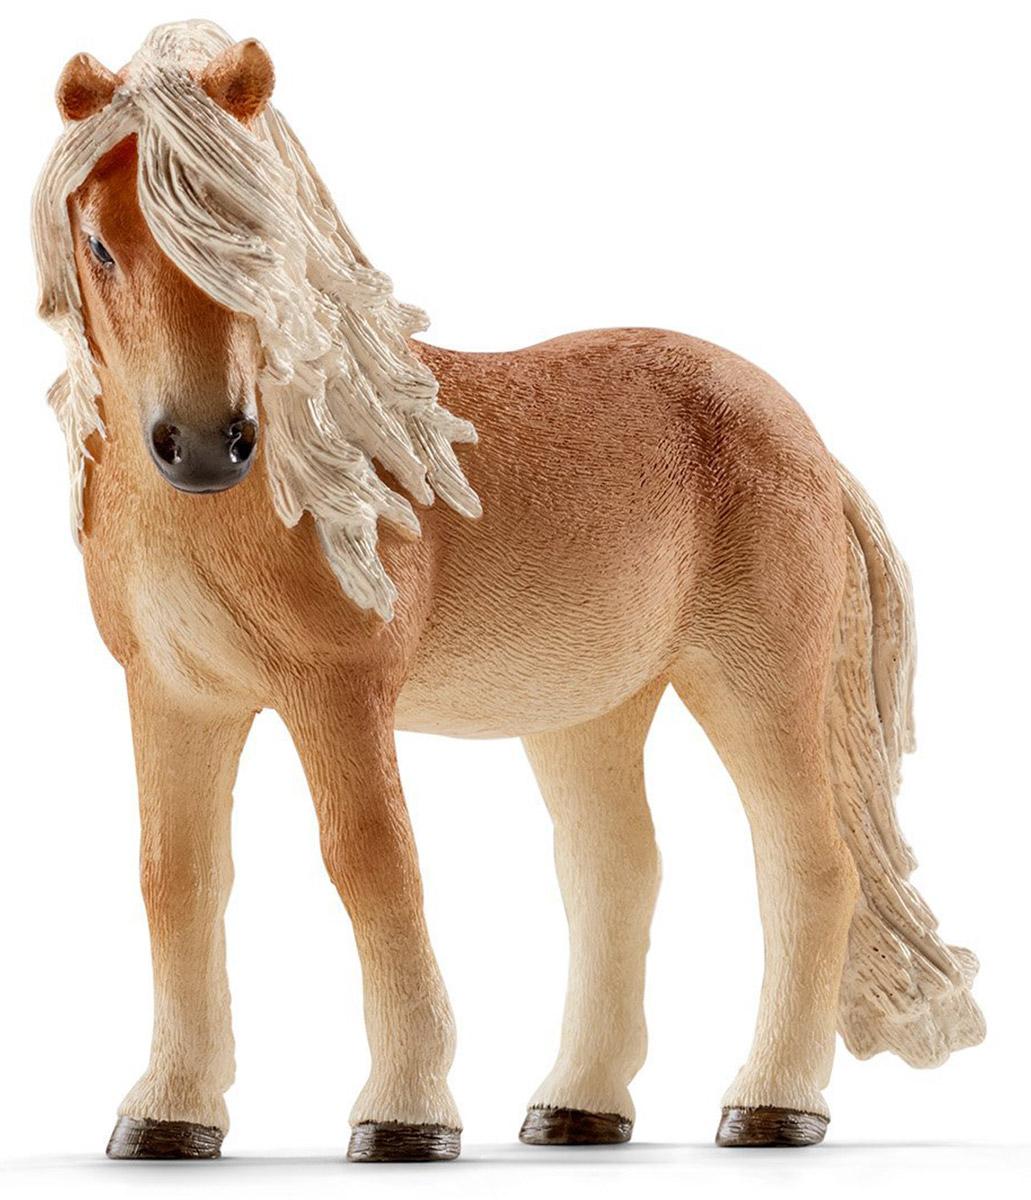 Schleich Фигурка Исландская кобыла фигурка карликовый козел schleich фигурка карликовый козел